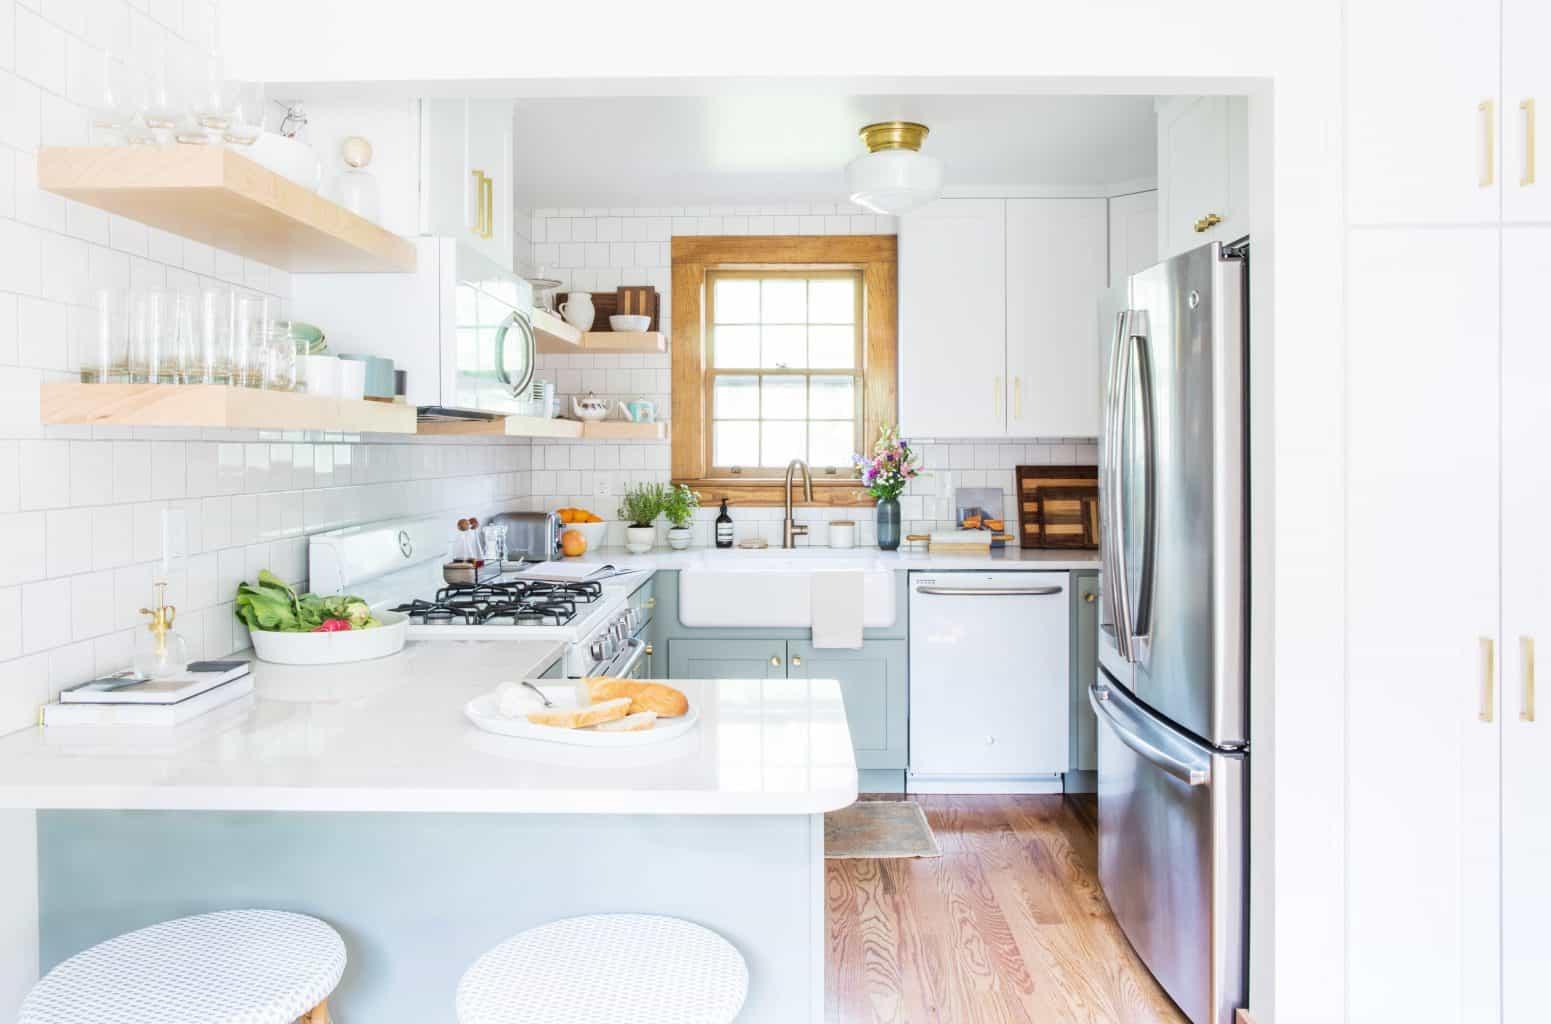 Tennessee Tudor Kitchen | Standard Kitchen and Bath | Knoxville, TN ...